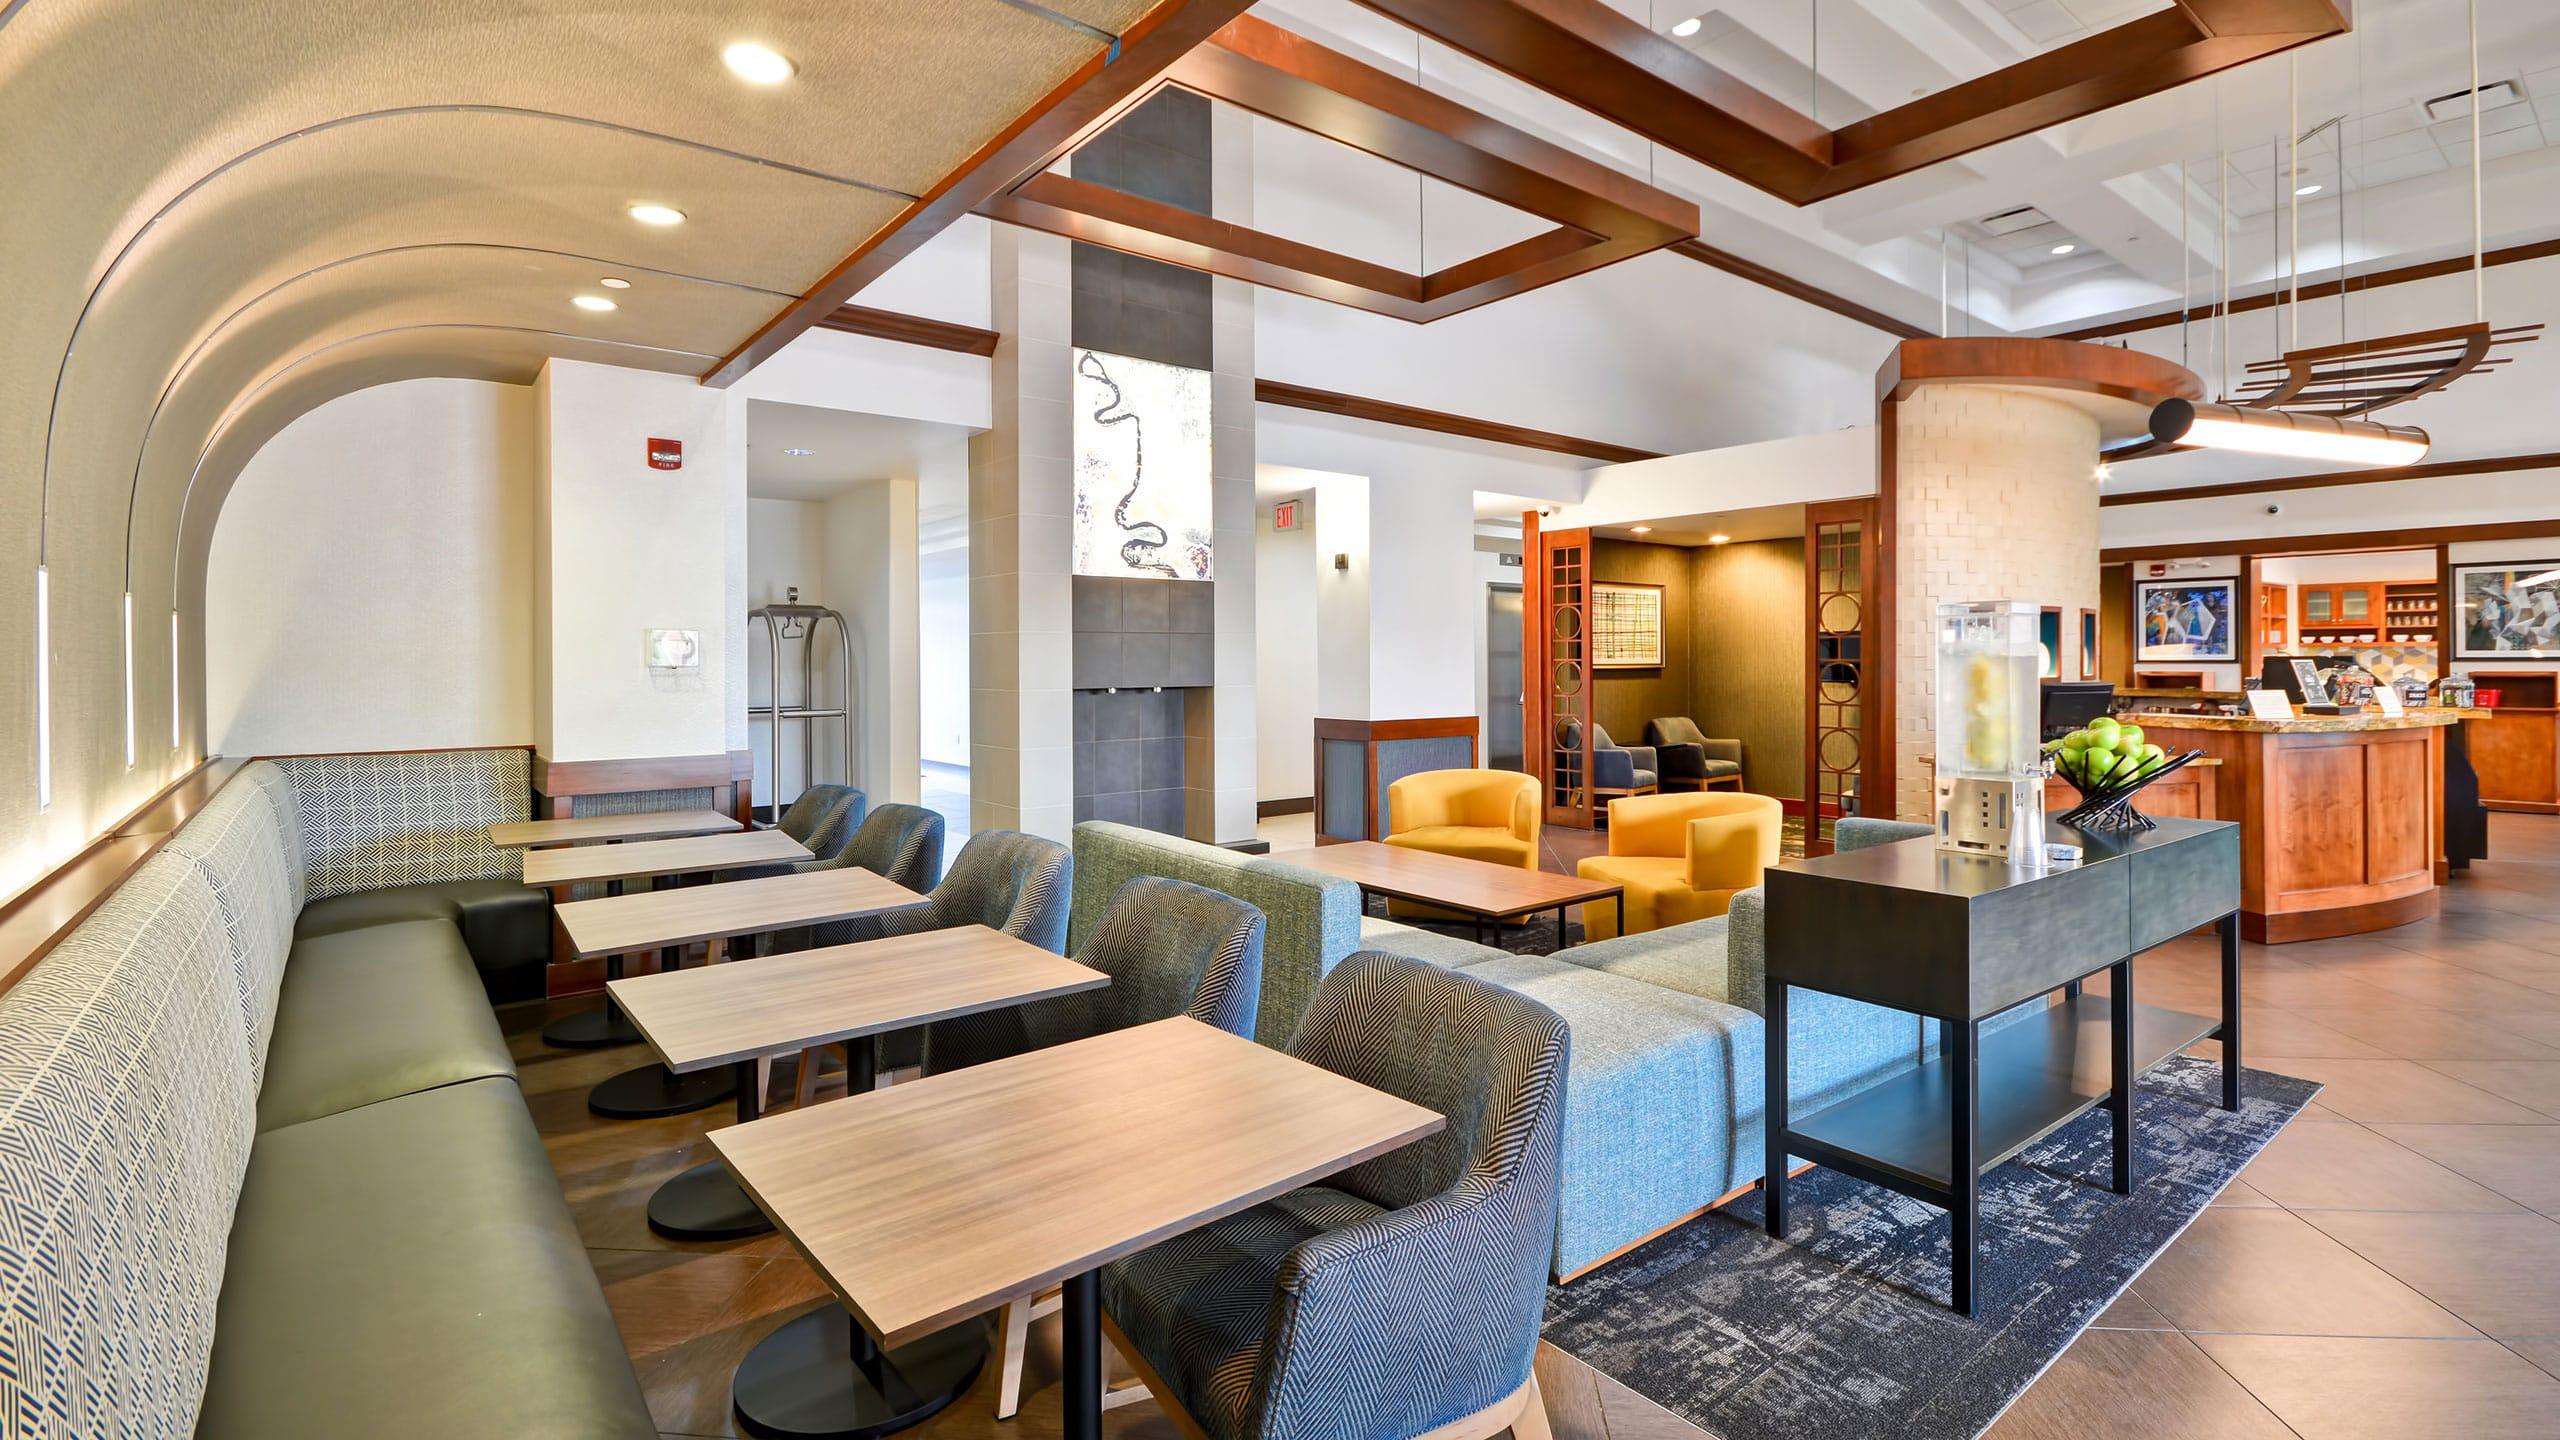 Comfortable Hotel In Baton Rouge Hyatt Place Baton Rougei 10